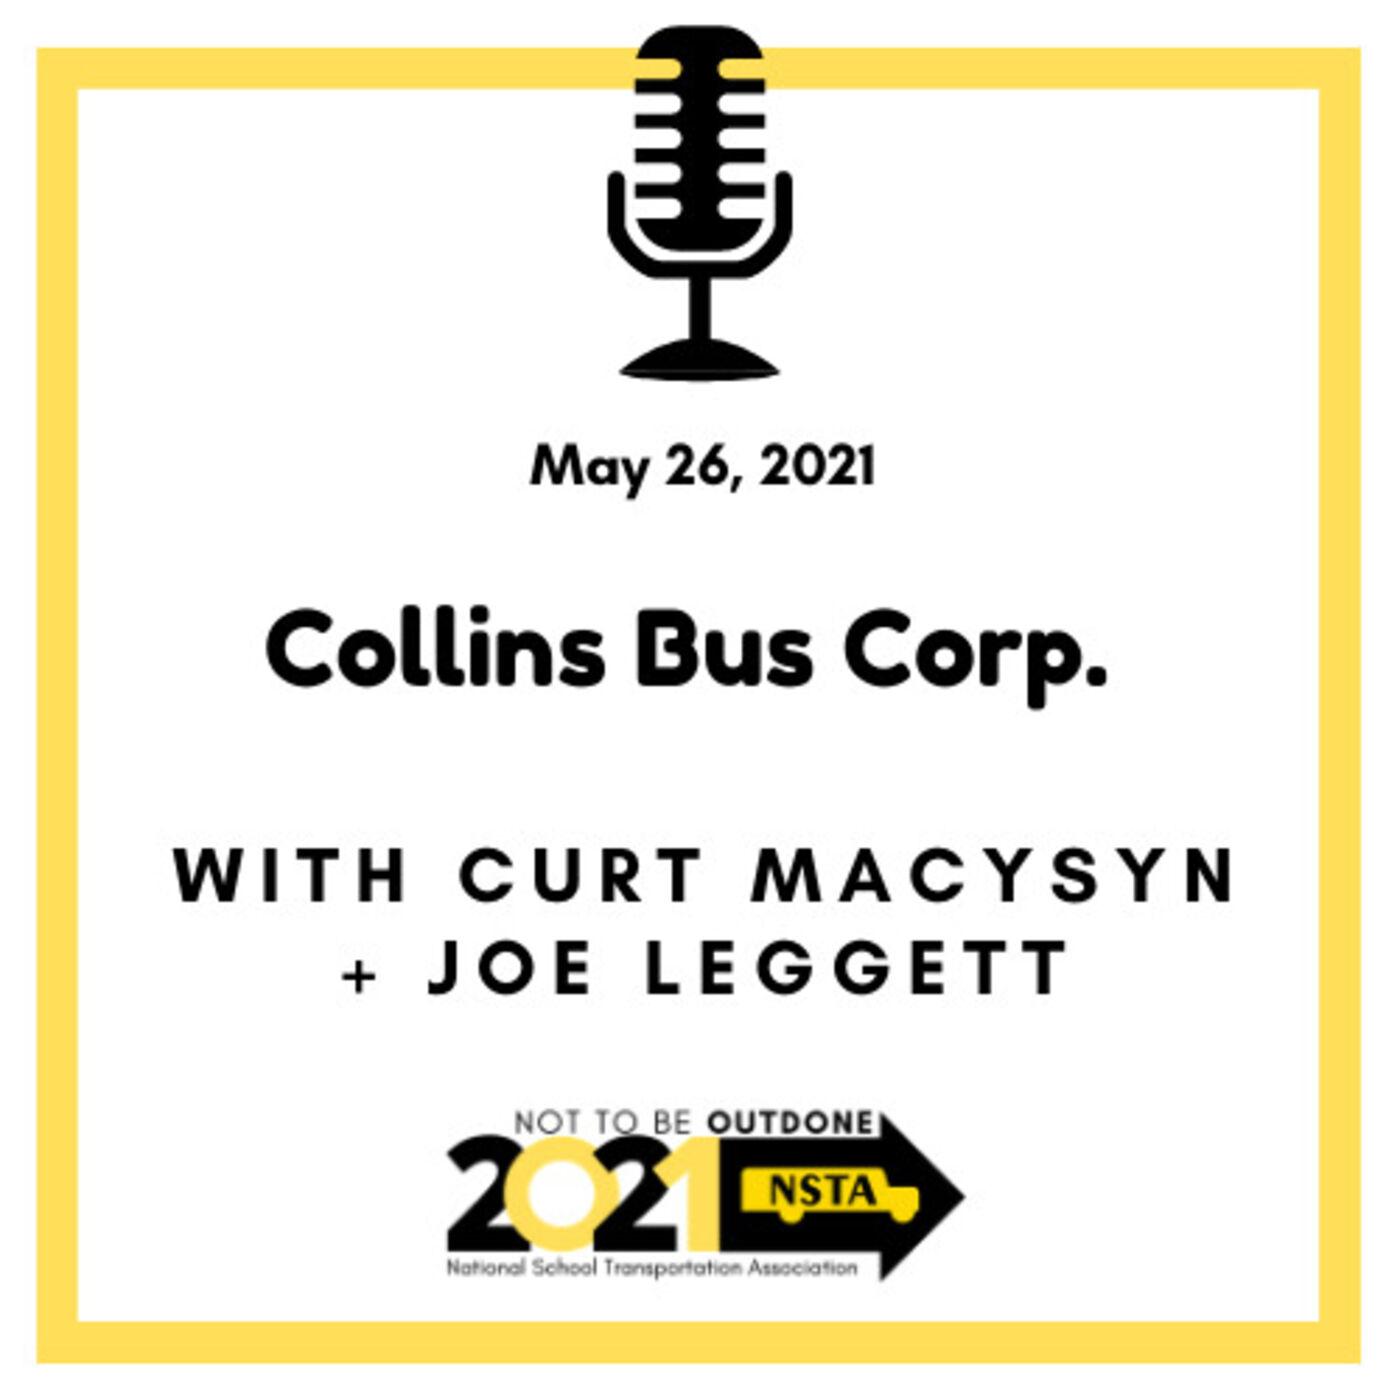 Joe Leggett, Director of Sales - Aftermarket Parts, Collins Bus Corp.